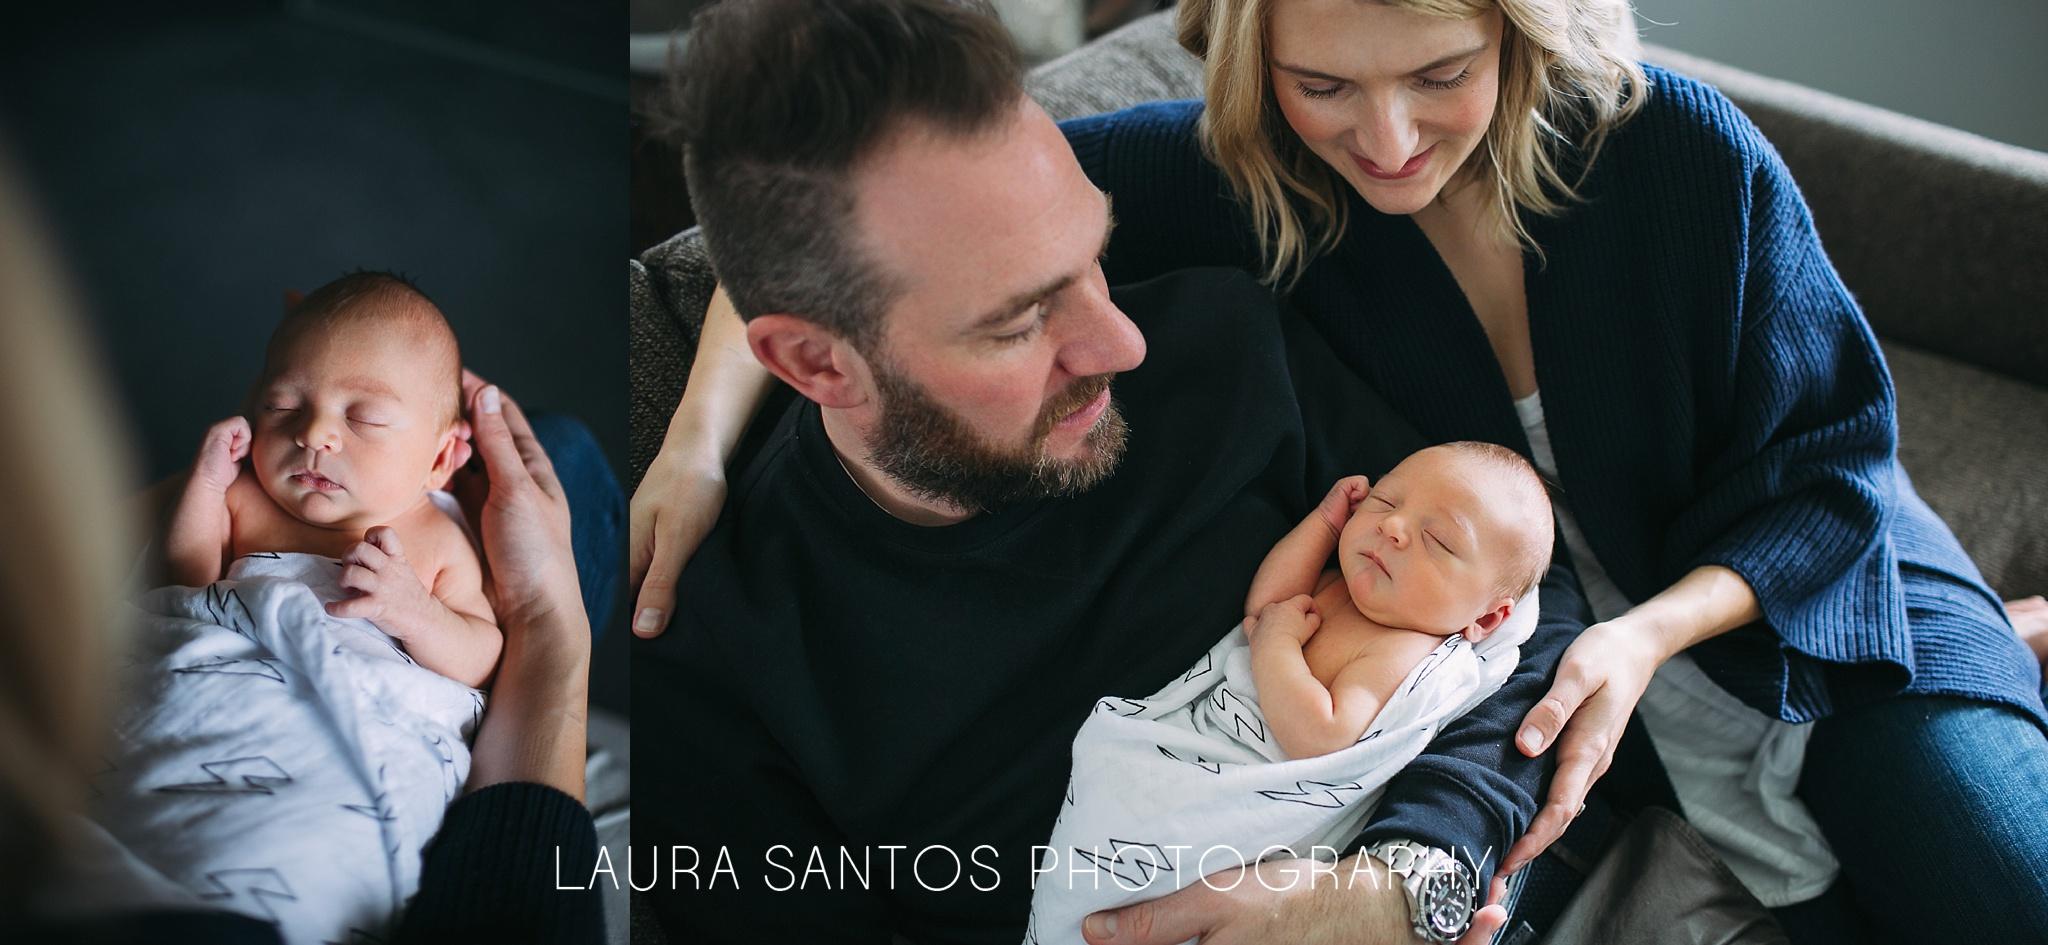 Laura Santos Photography Portland Oregon Family Photographer_0176.jpg